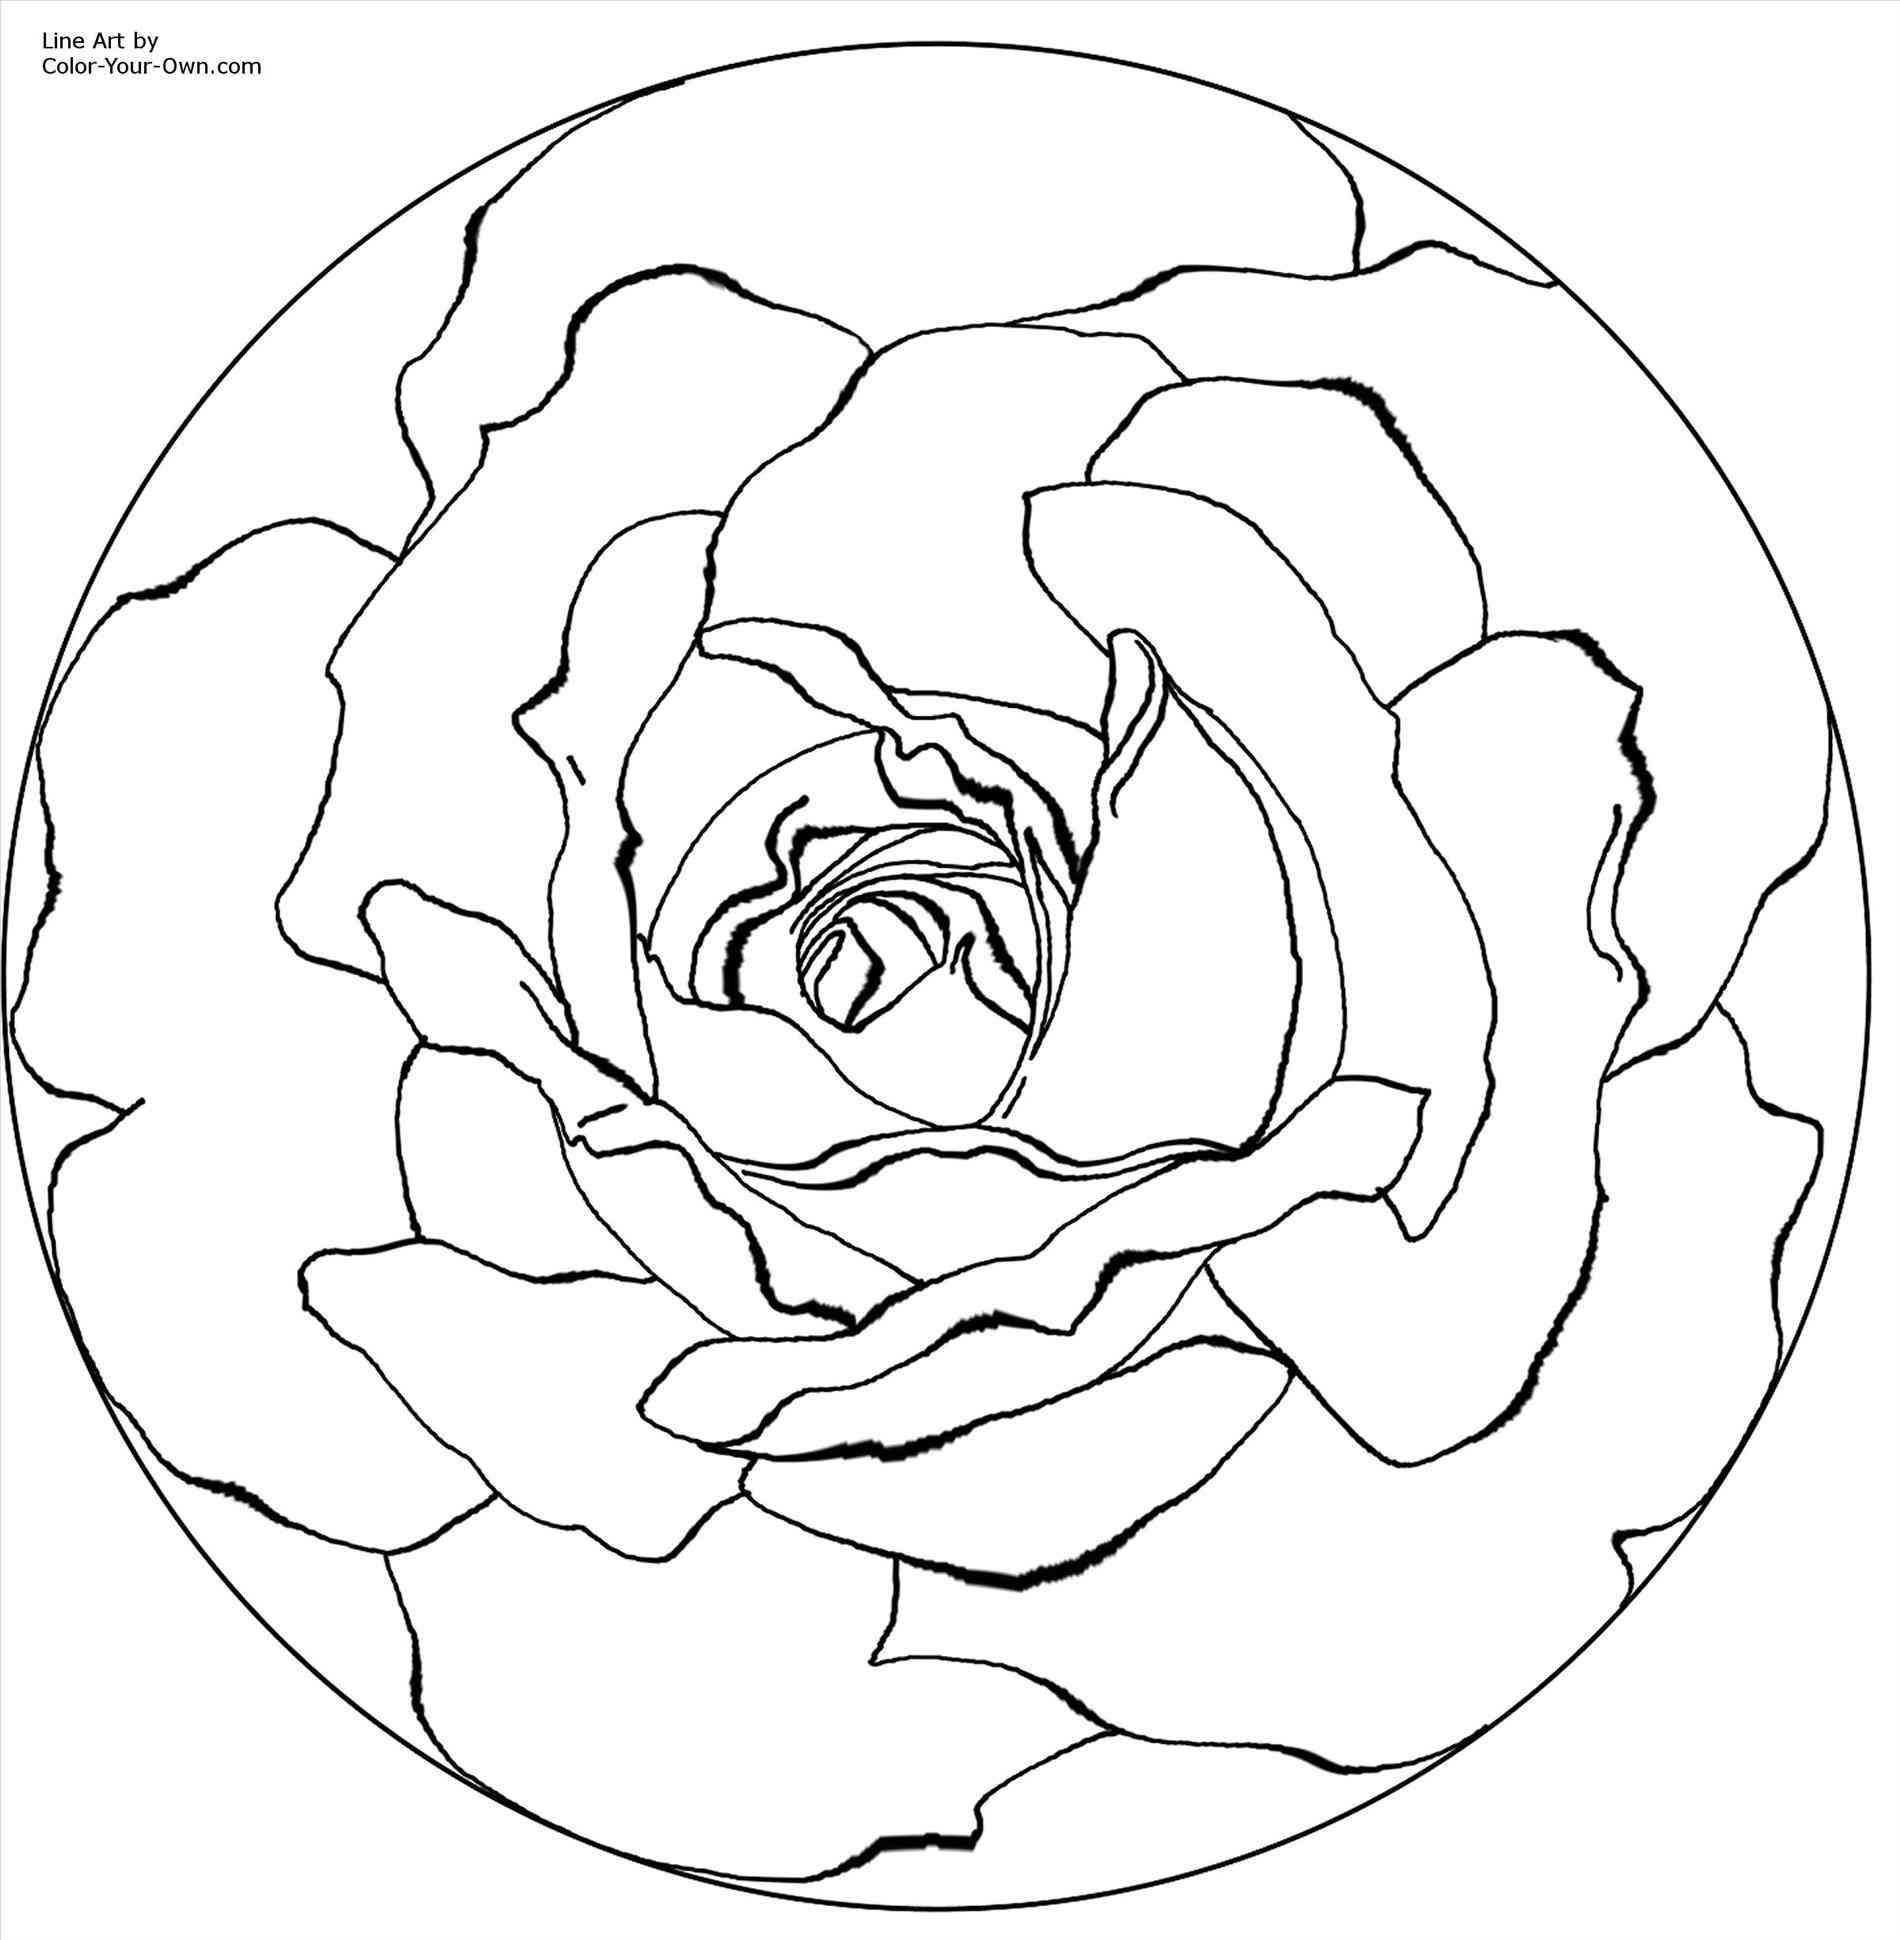 1900x1940 Flowers Dahlia Bloom Drawings Line Rose Drawing Outline